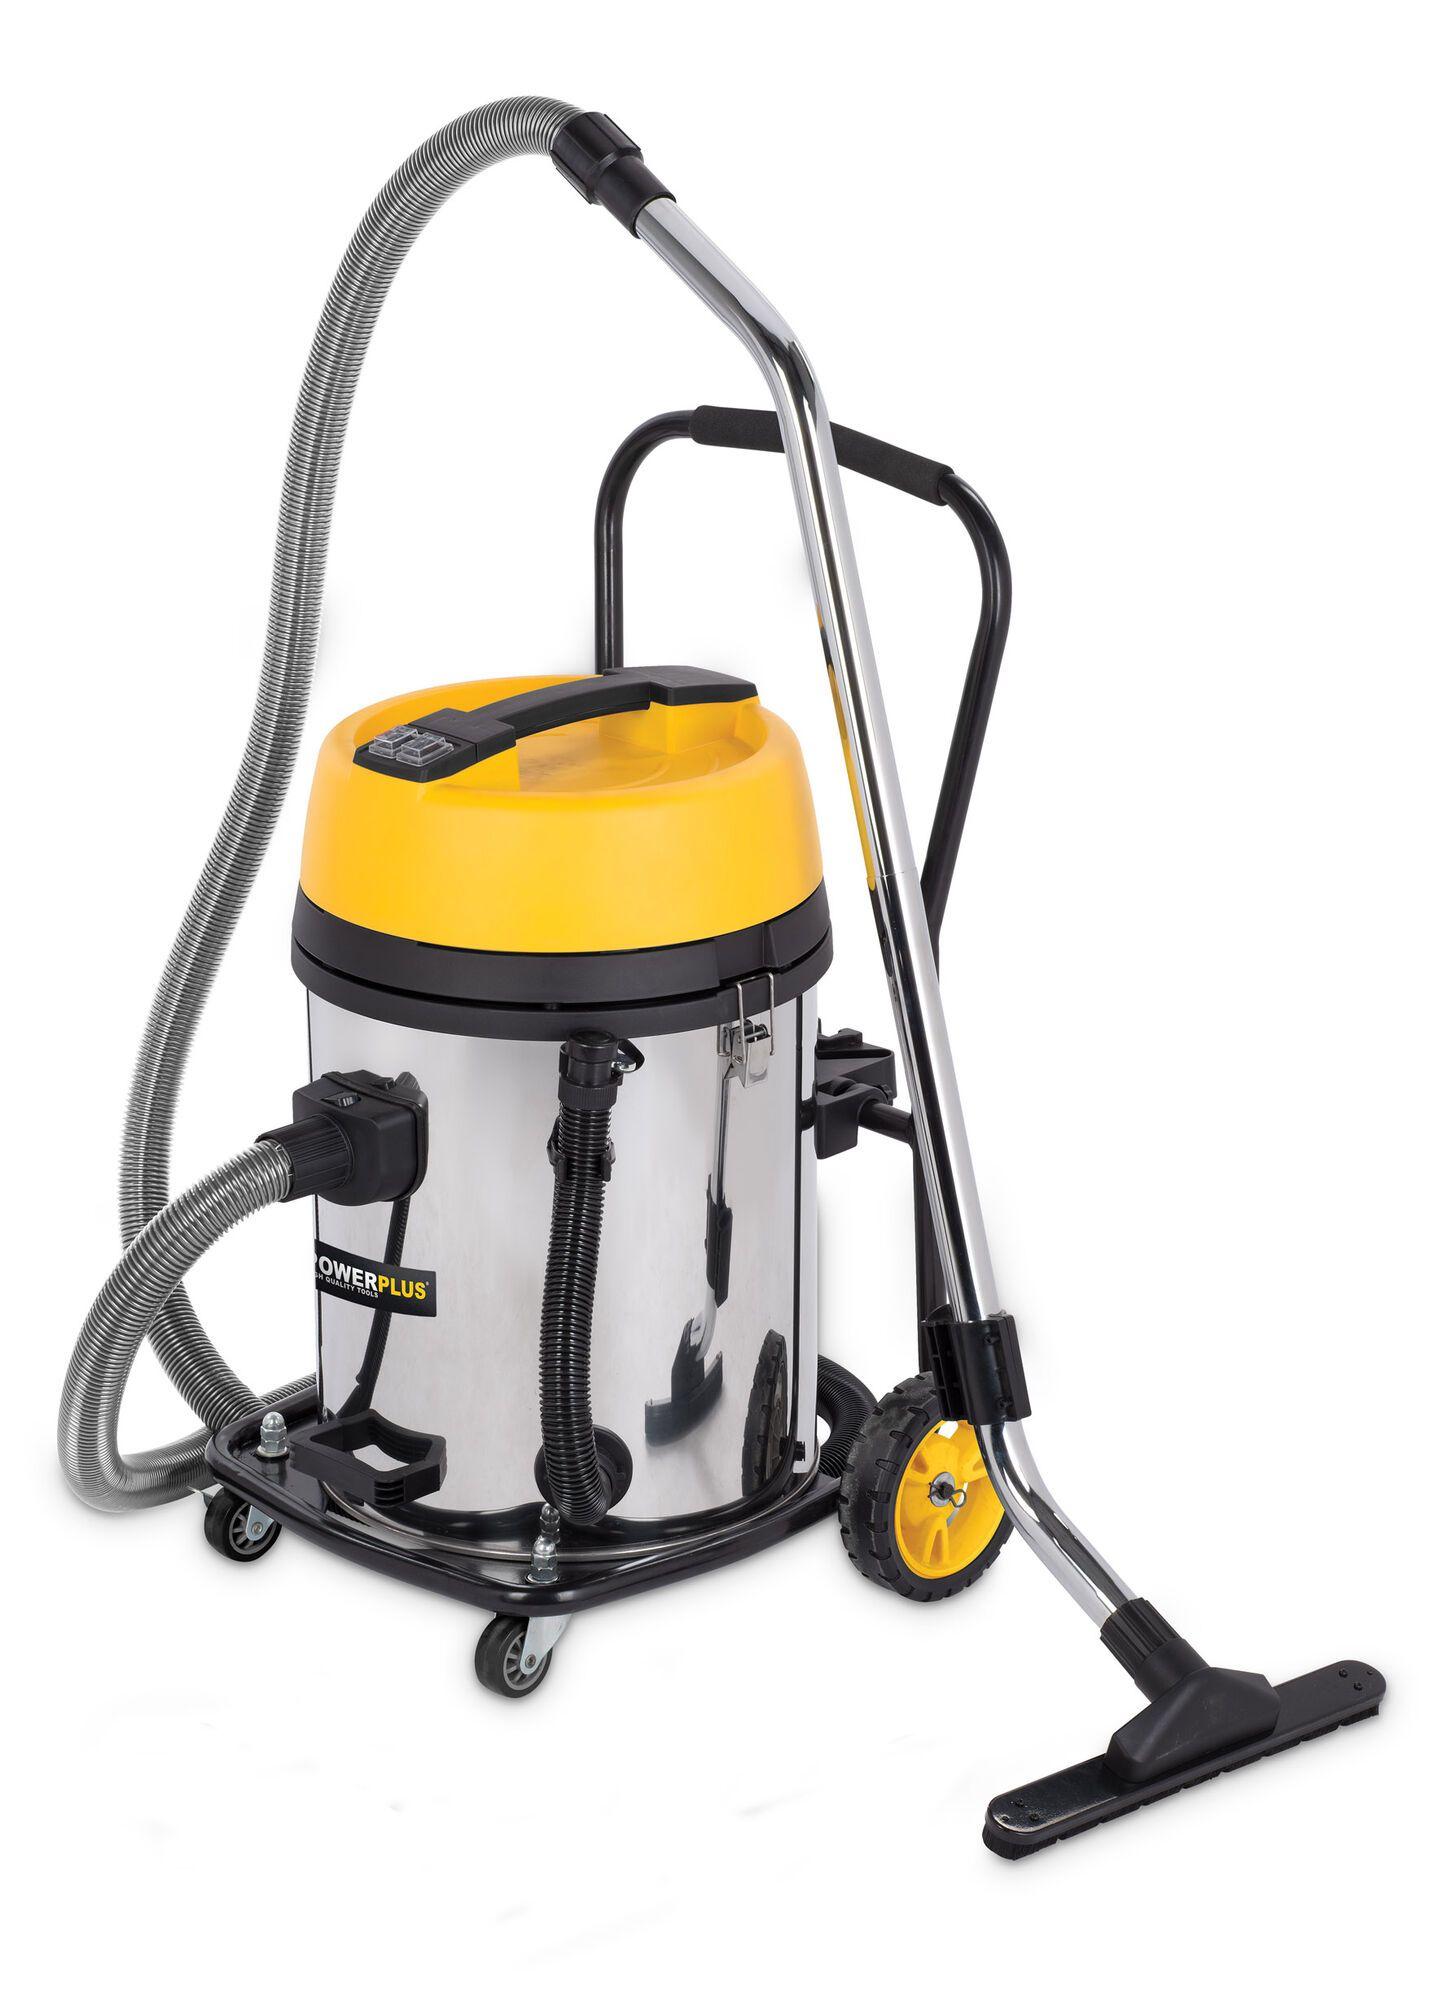 Powerplus POWX325 Alleszuiger 2x1200W | Stof en waterzuiger met 60 liter ketel met Hepa filter